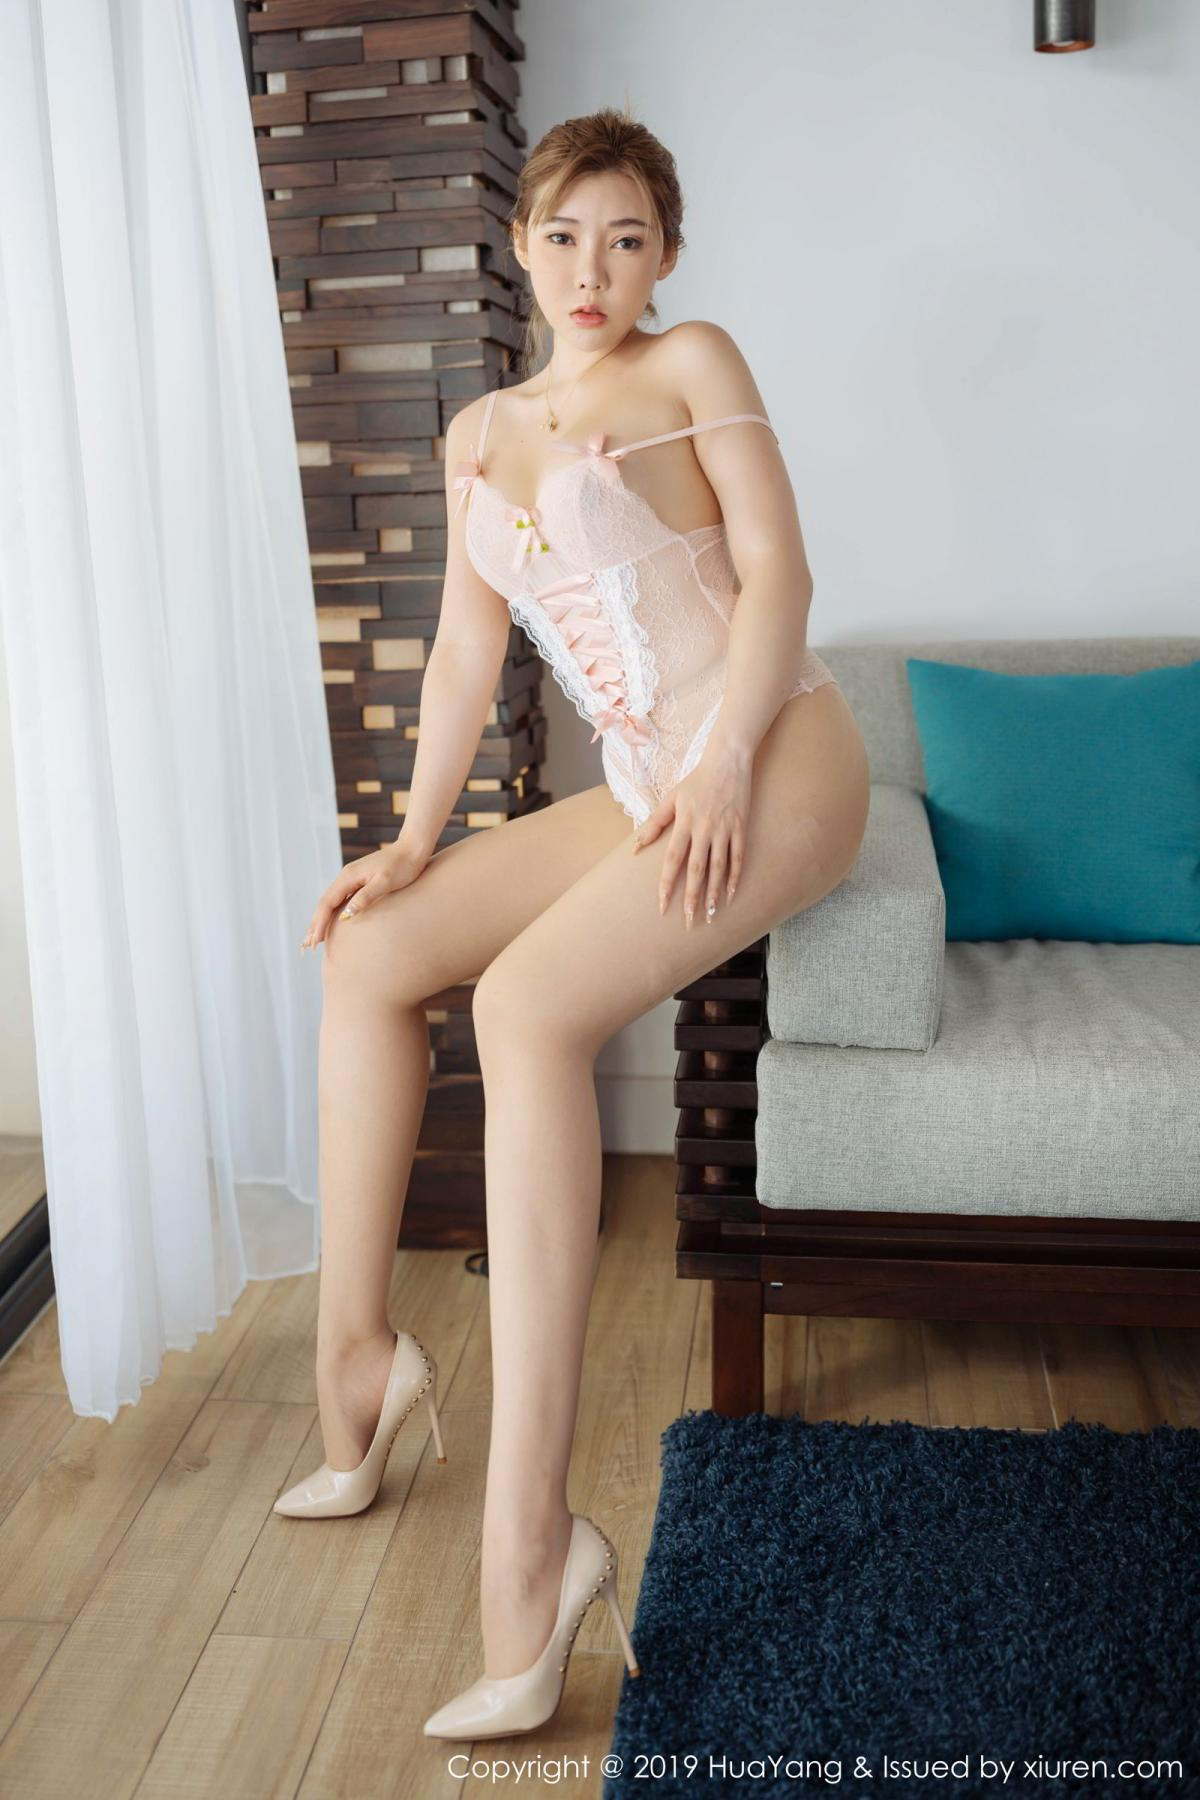 [Huayang] Vol.174 Meng Han Yao 15P, HuaYang, Meng Han Yao, Underwear